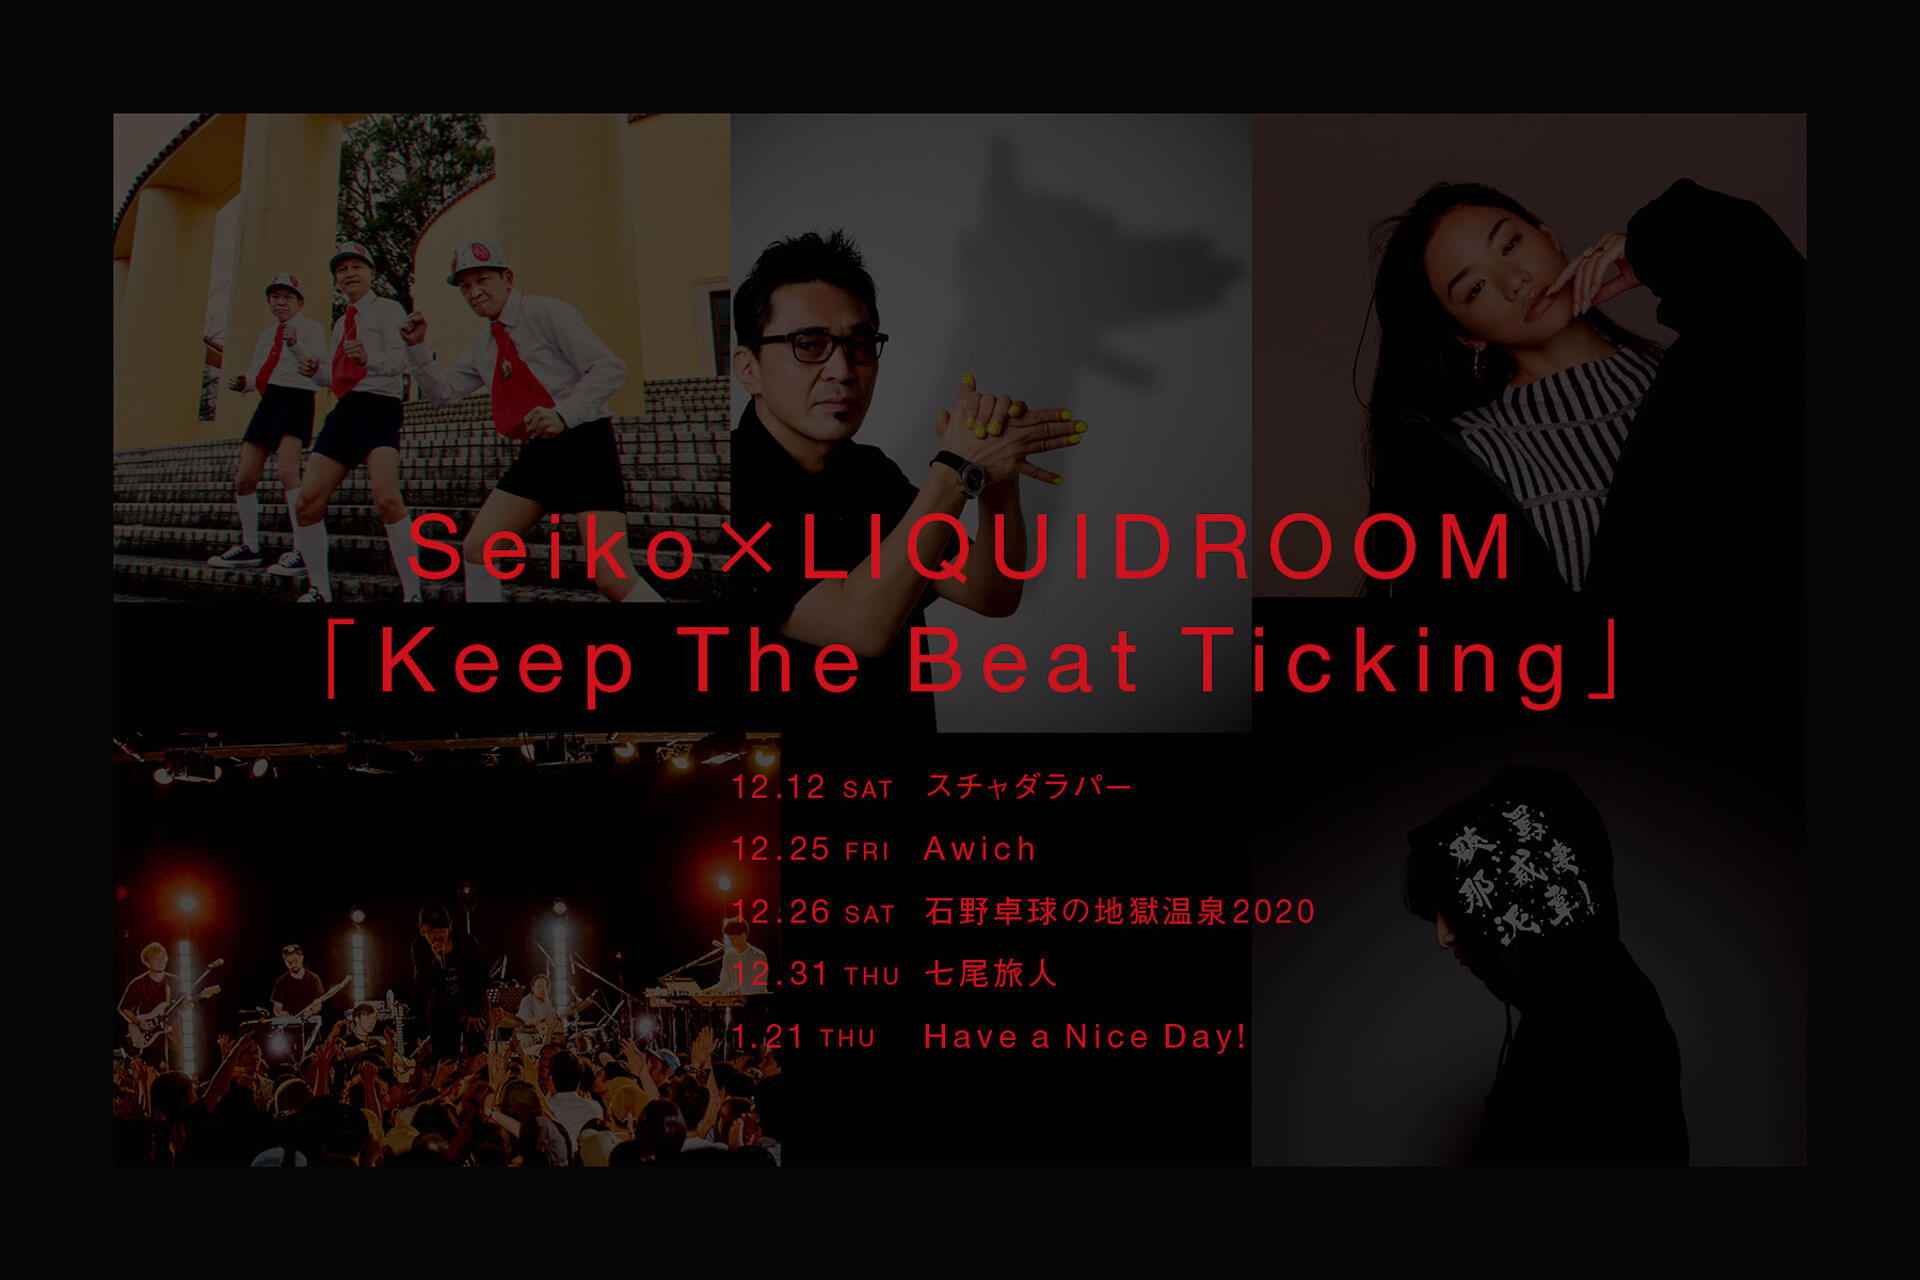 Keep The Beat Ticking「音楽の針を止めない」| Seiko × LIQUIDROOMのコラボレーションが決定 music201211-KeepTheBeatTicking